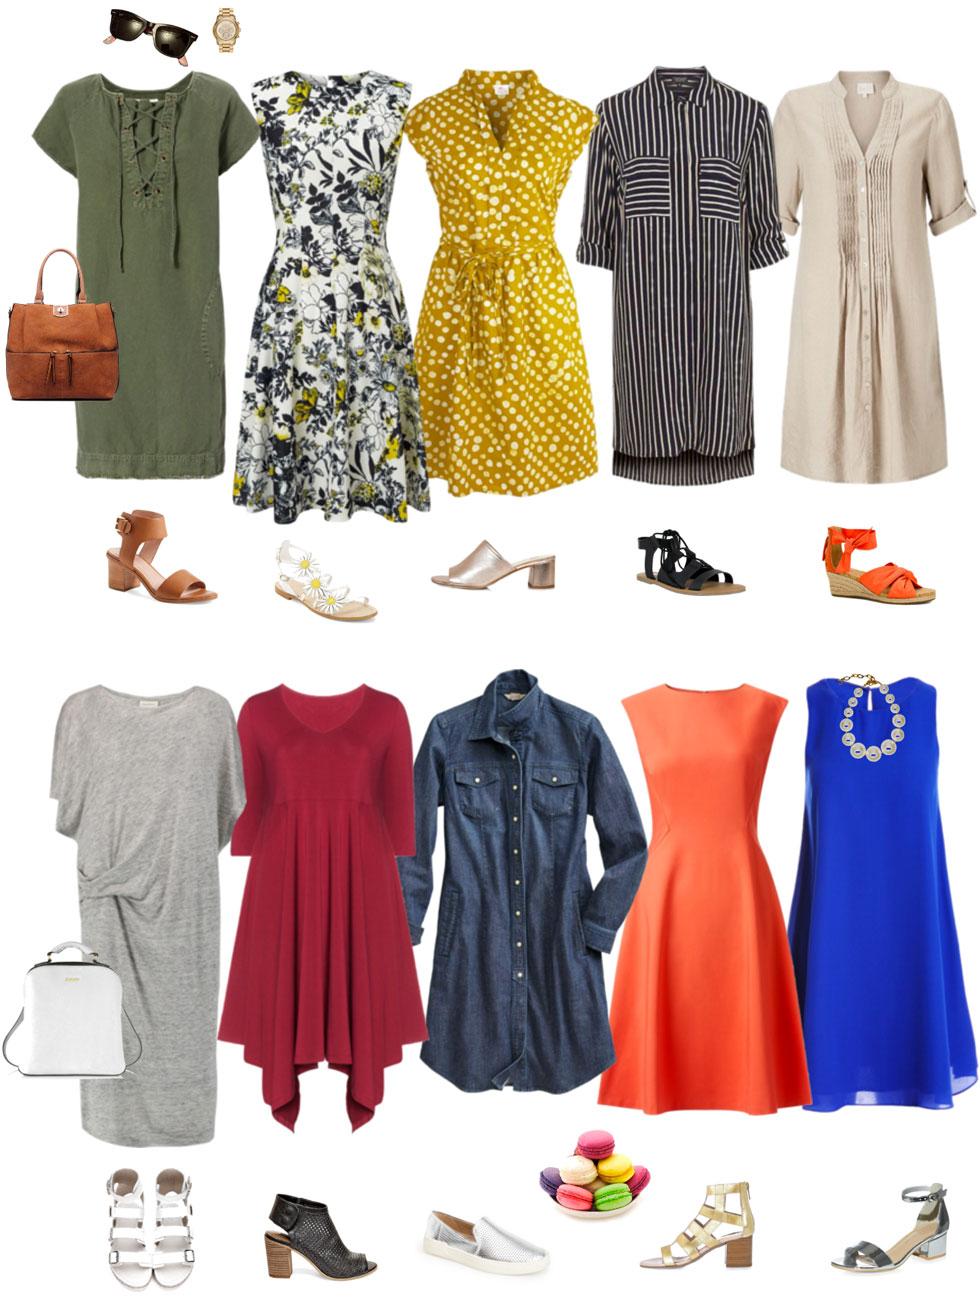 Summer Dress and Sandals